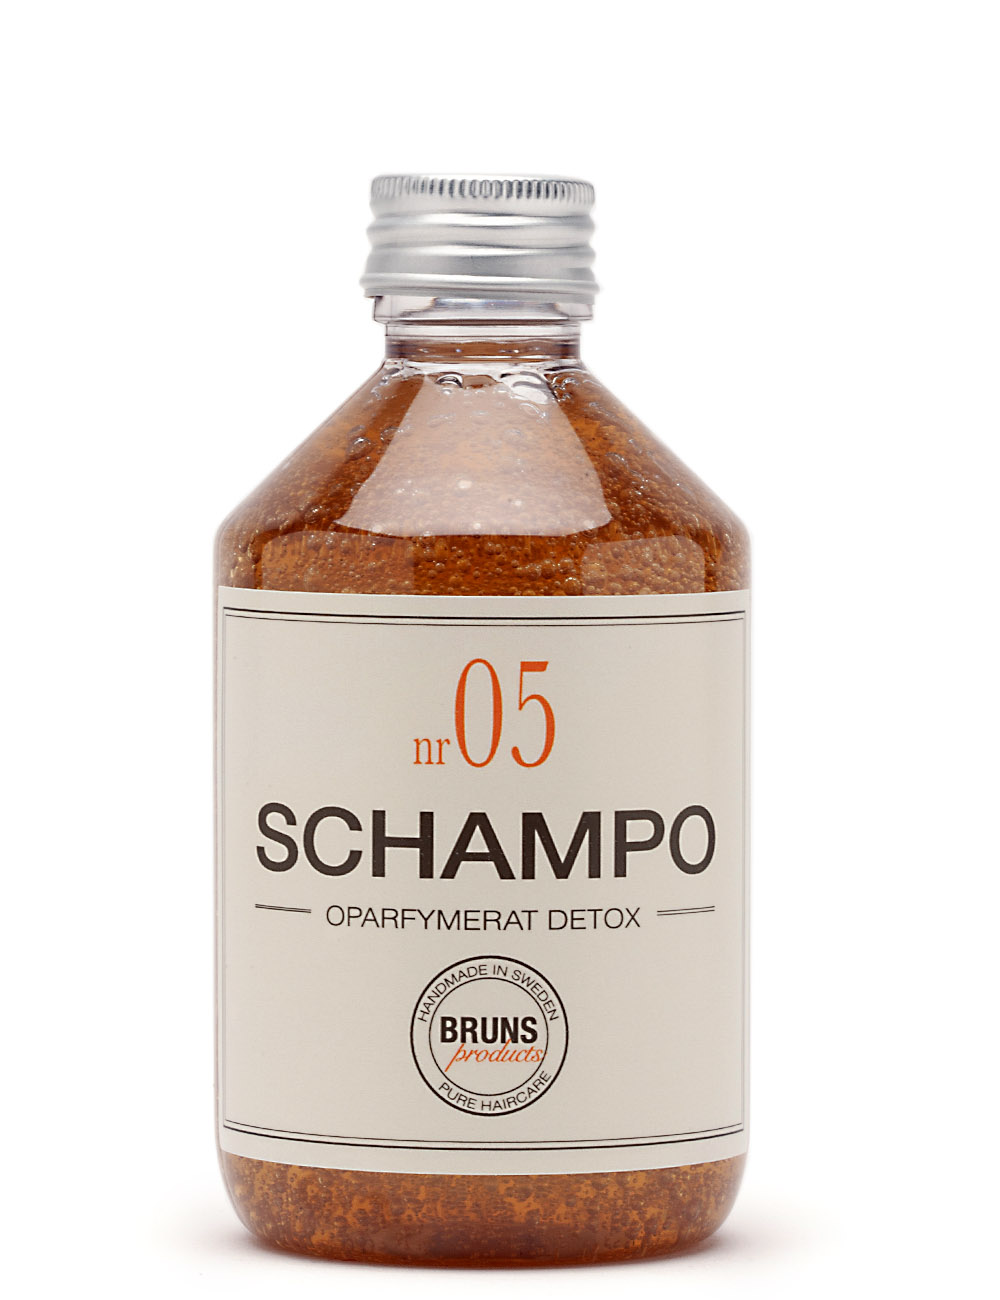 BRUNS Products Nr05 Unscented Detox Shampoo Hajusteeton Detox Shampoo 1000 ml